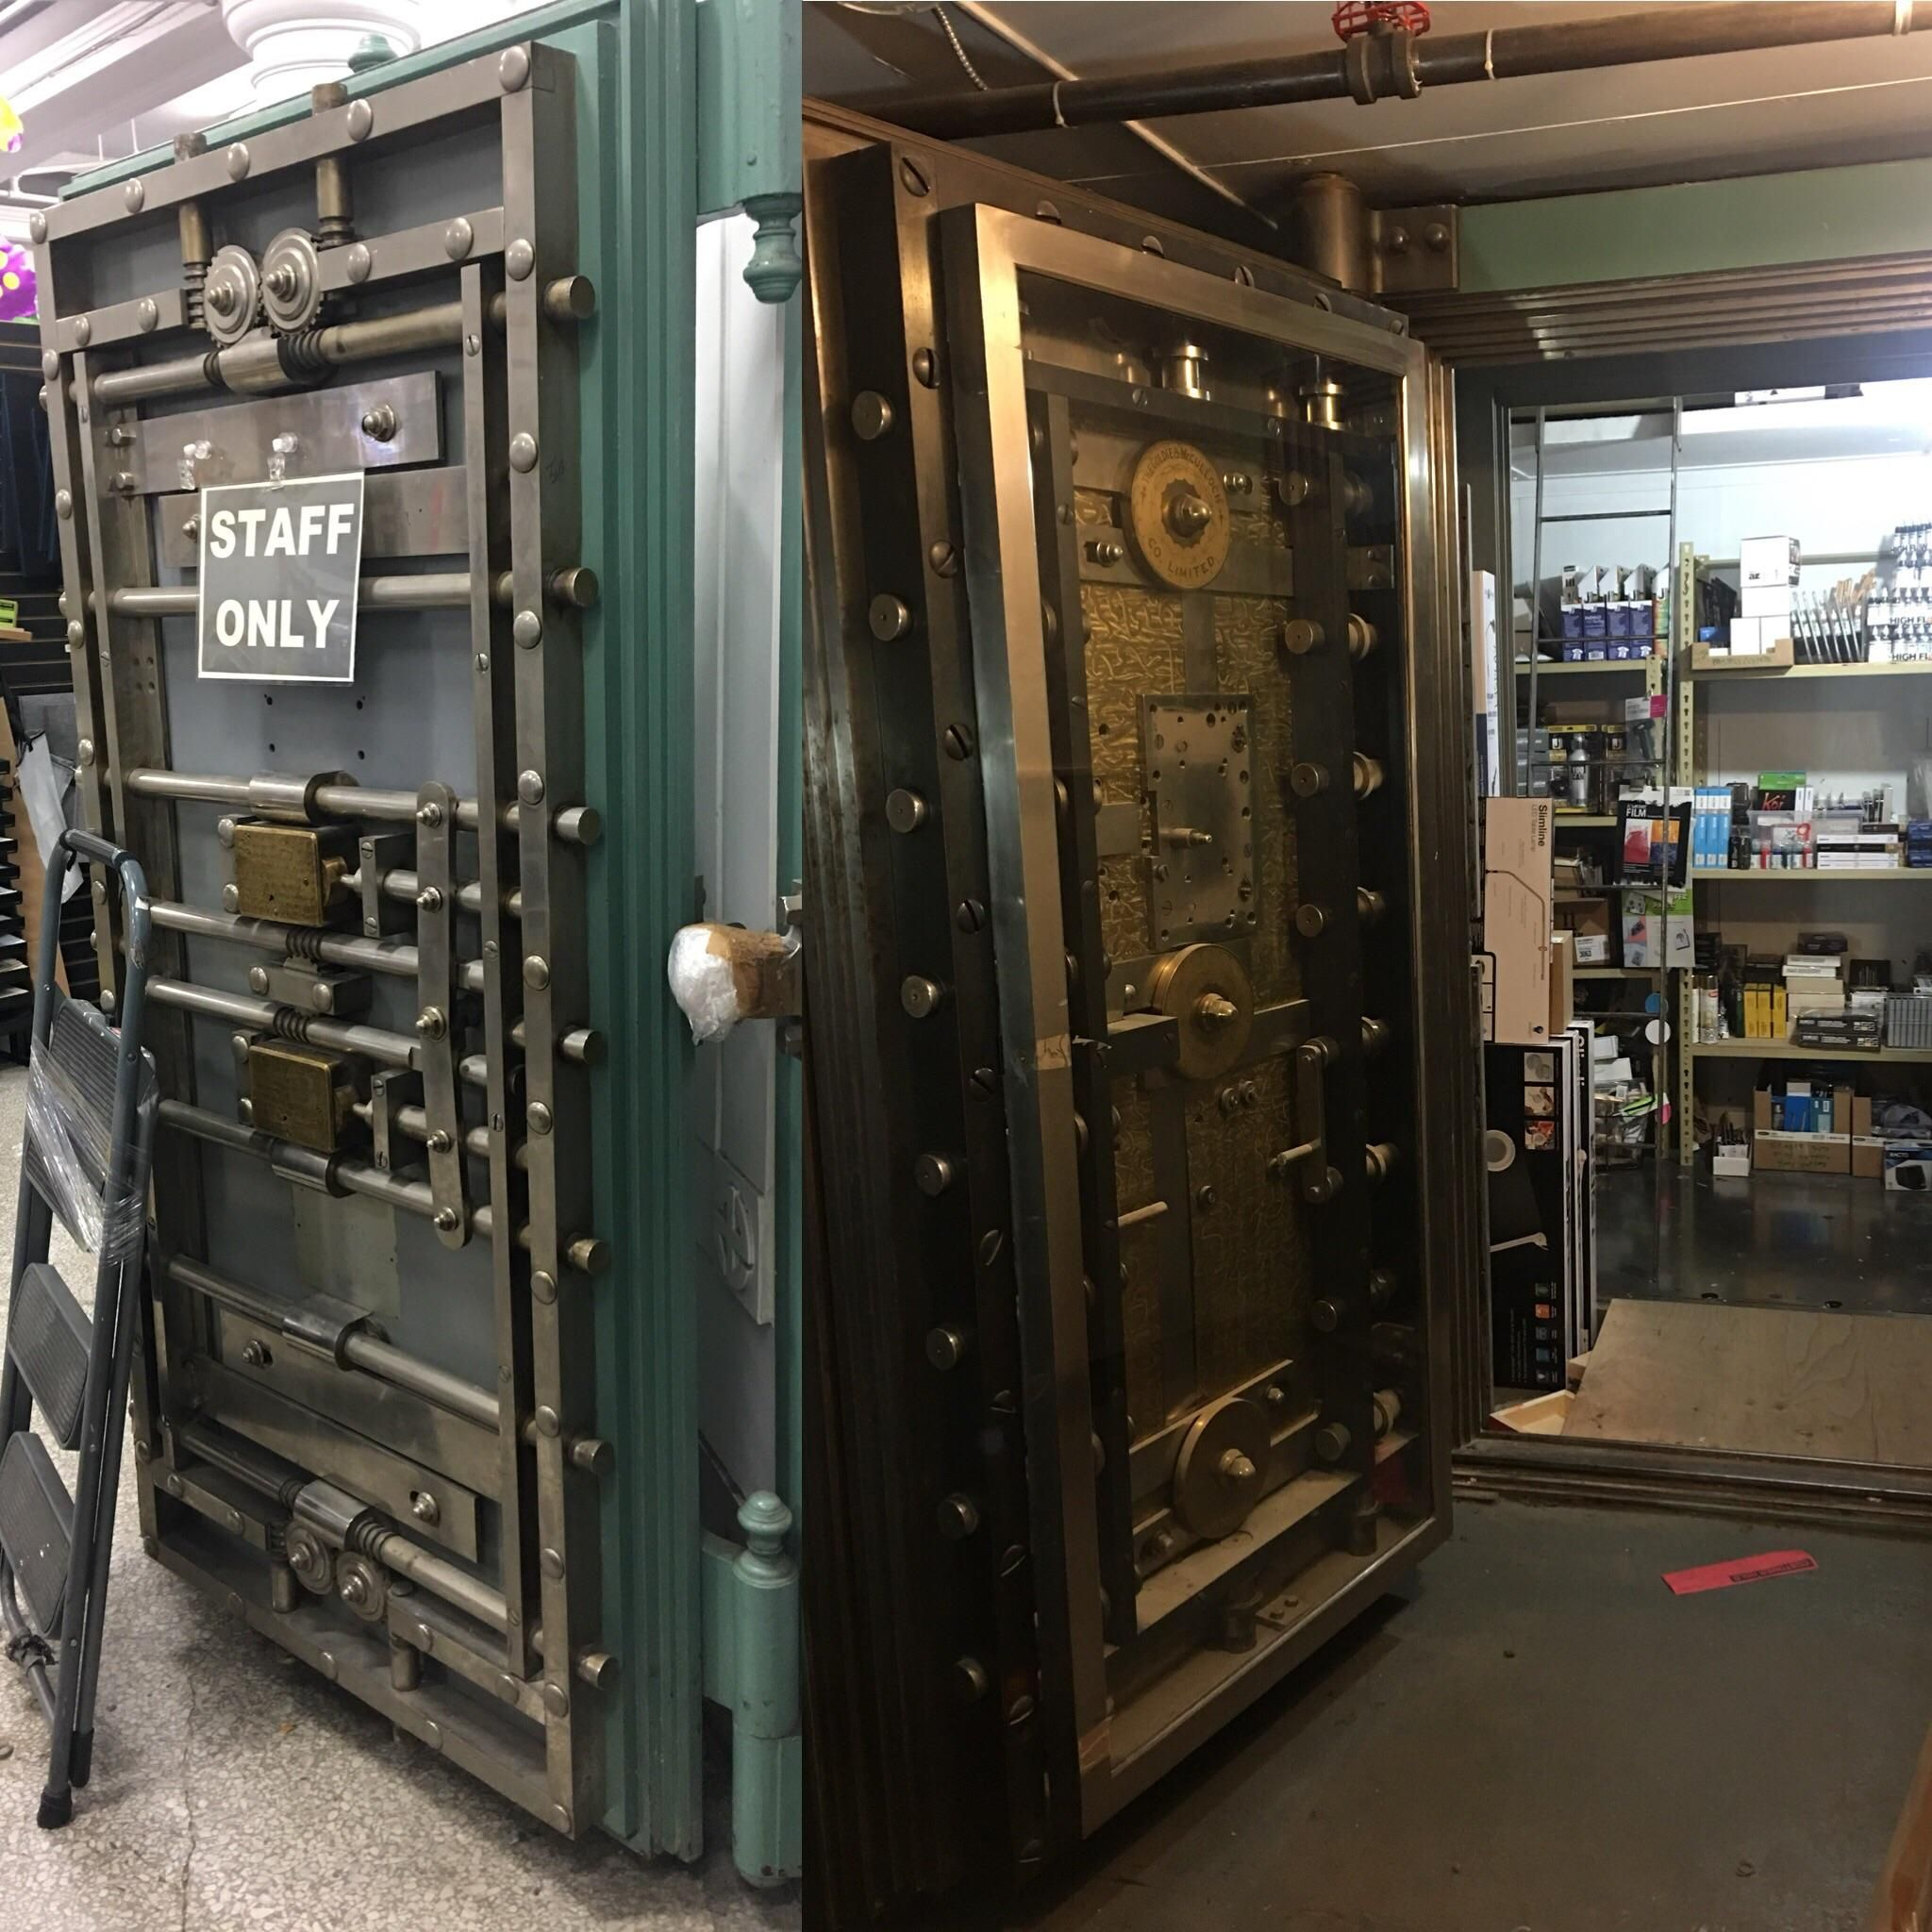 I work in a bank vault that has a bigger bank vault inside!